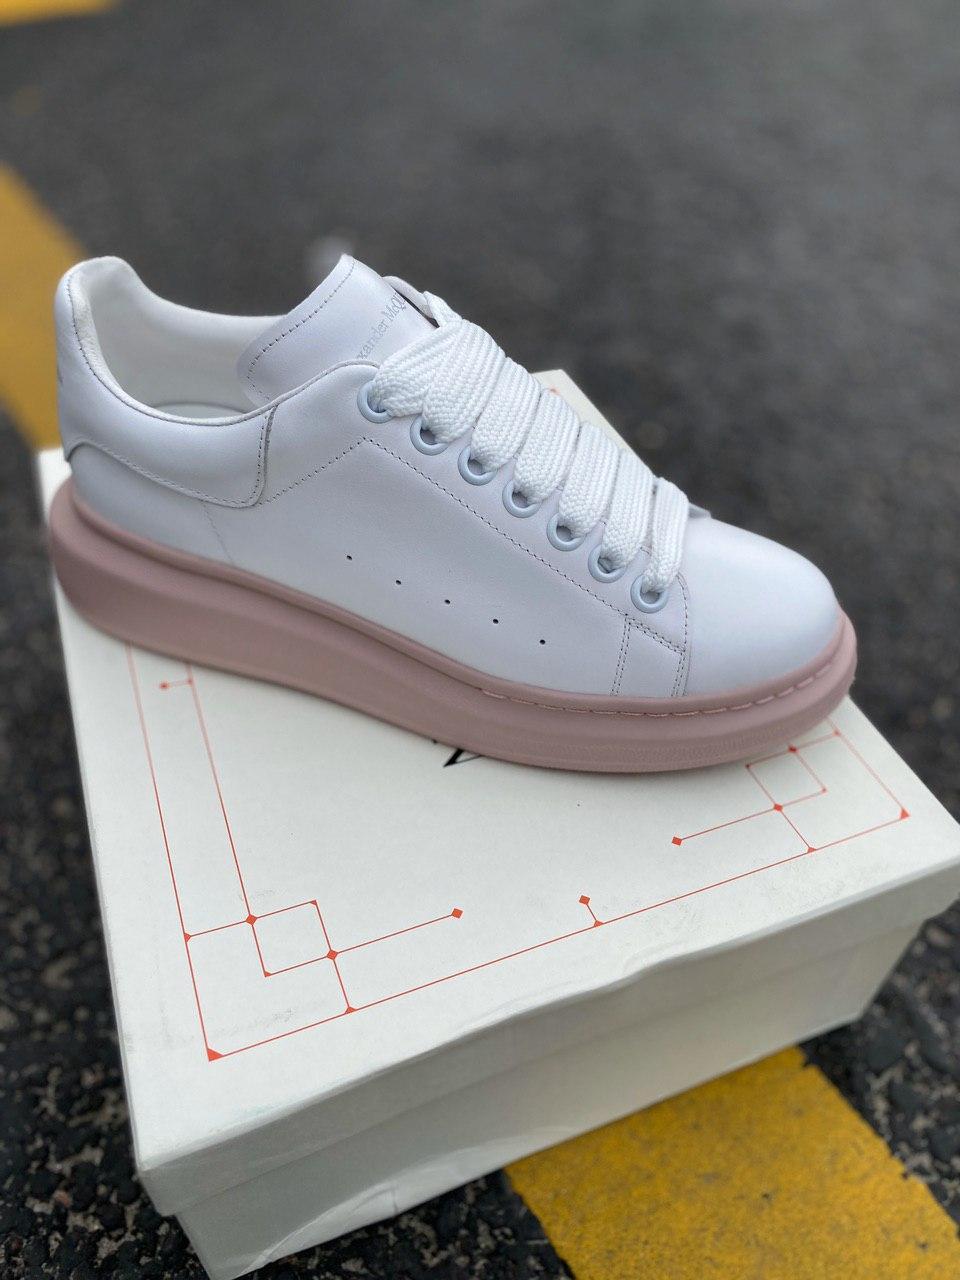 Стильні кросівки Alexander McQueen White|Pink LUX QUALITY (Олександр Маквин)